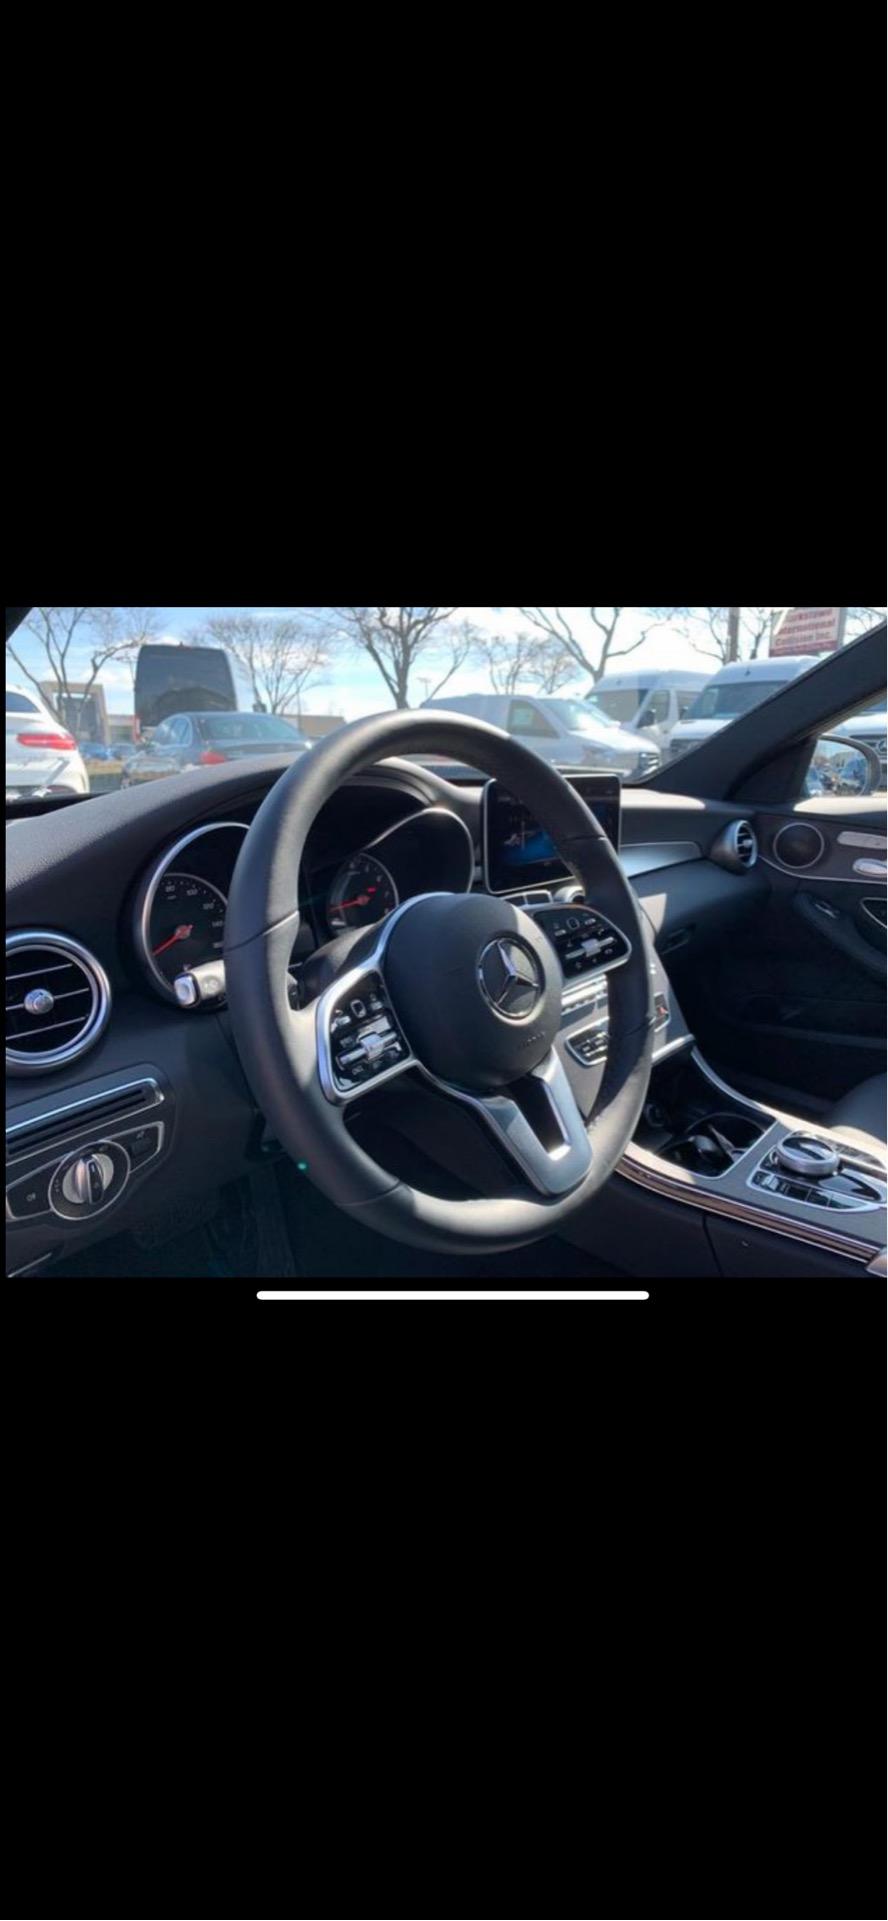 2020 Mercedes-Benz C-Class - photo 5